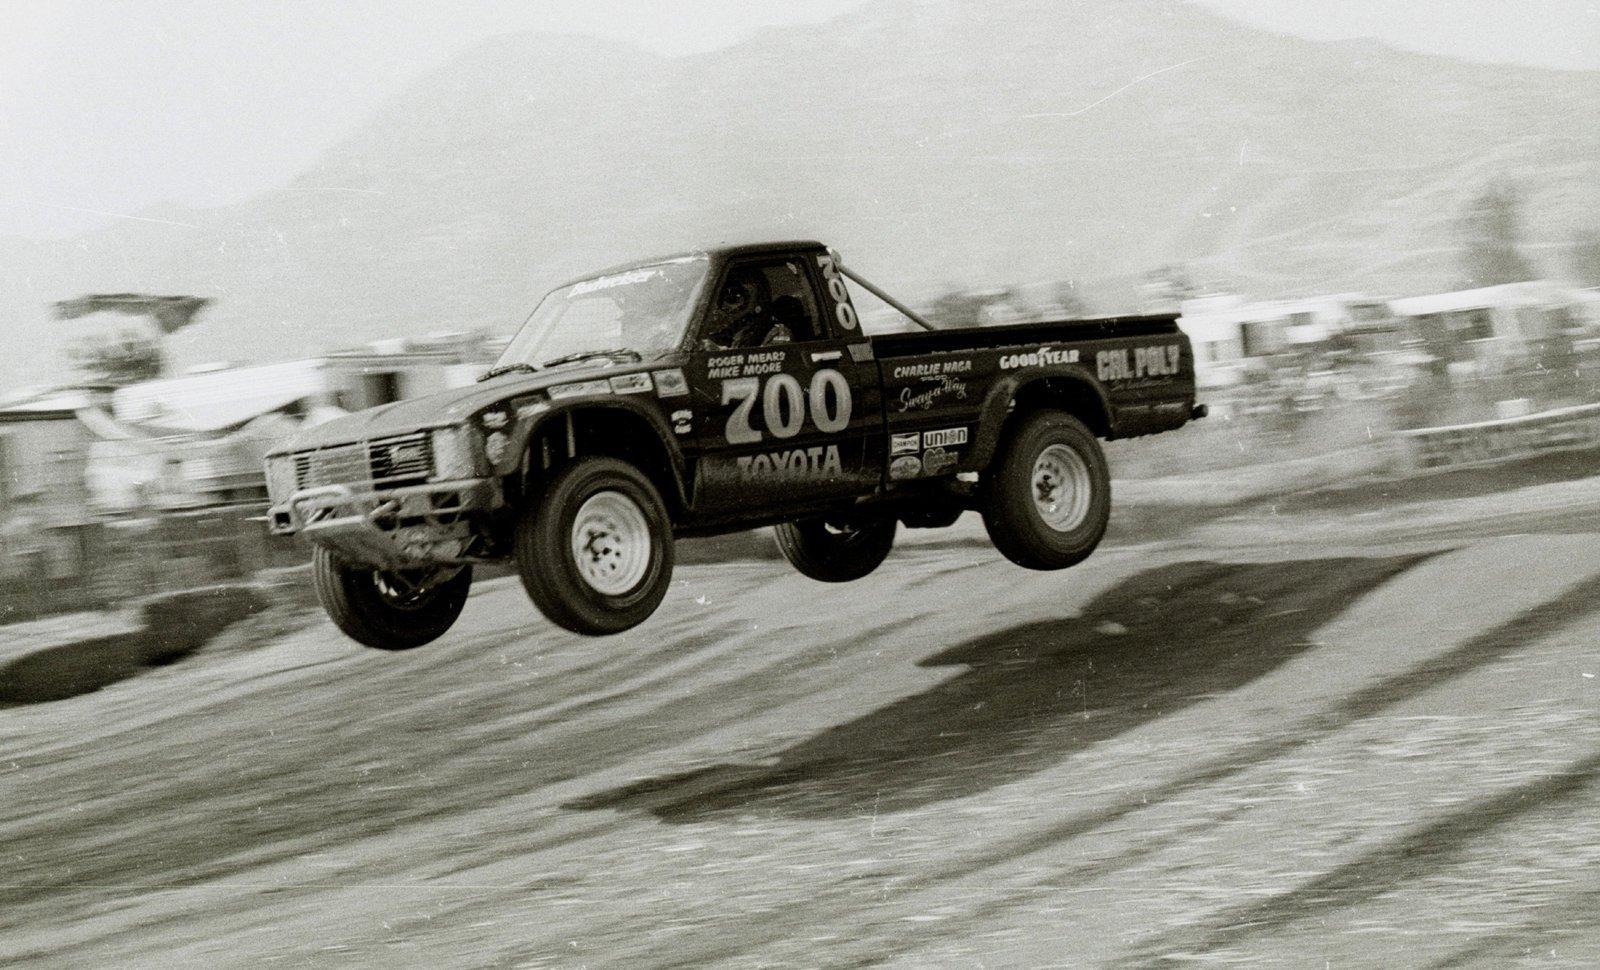 CenterlineImages.1981.Riverside.700.Mears.Moore.Bud Toyota.21x.jpg